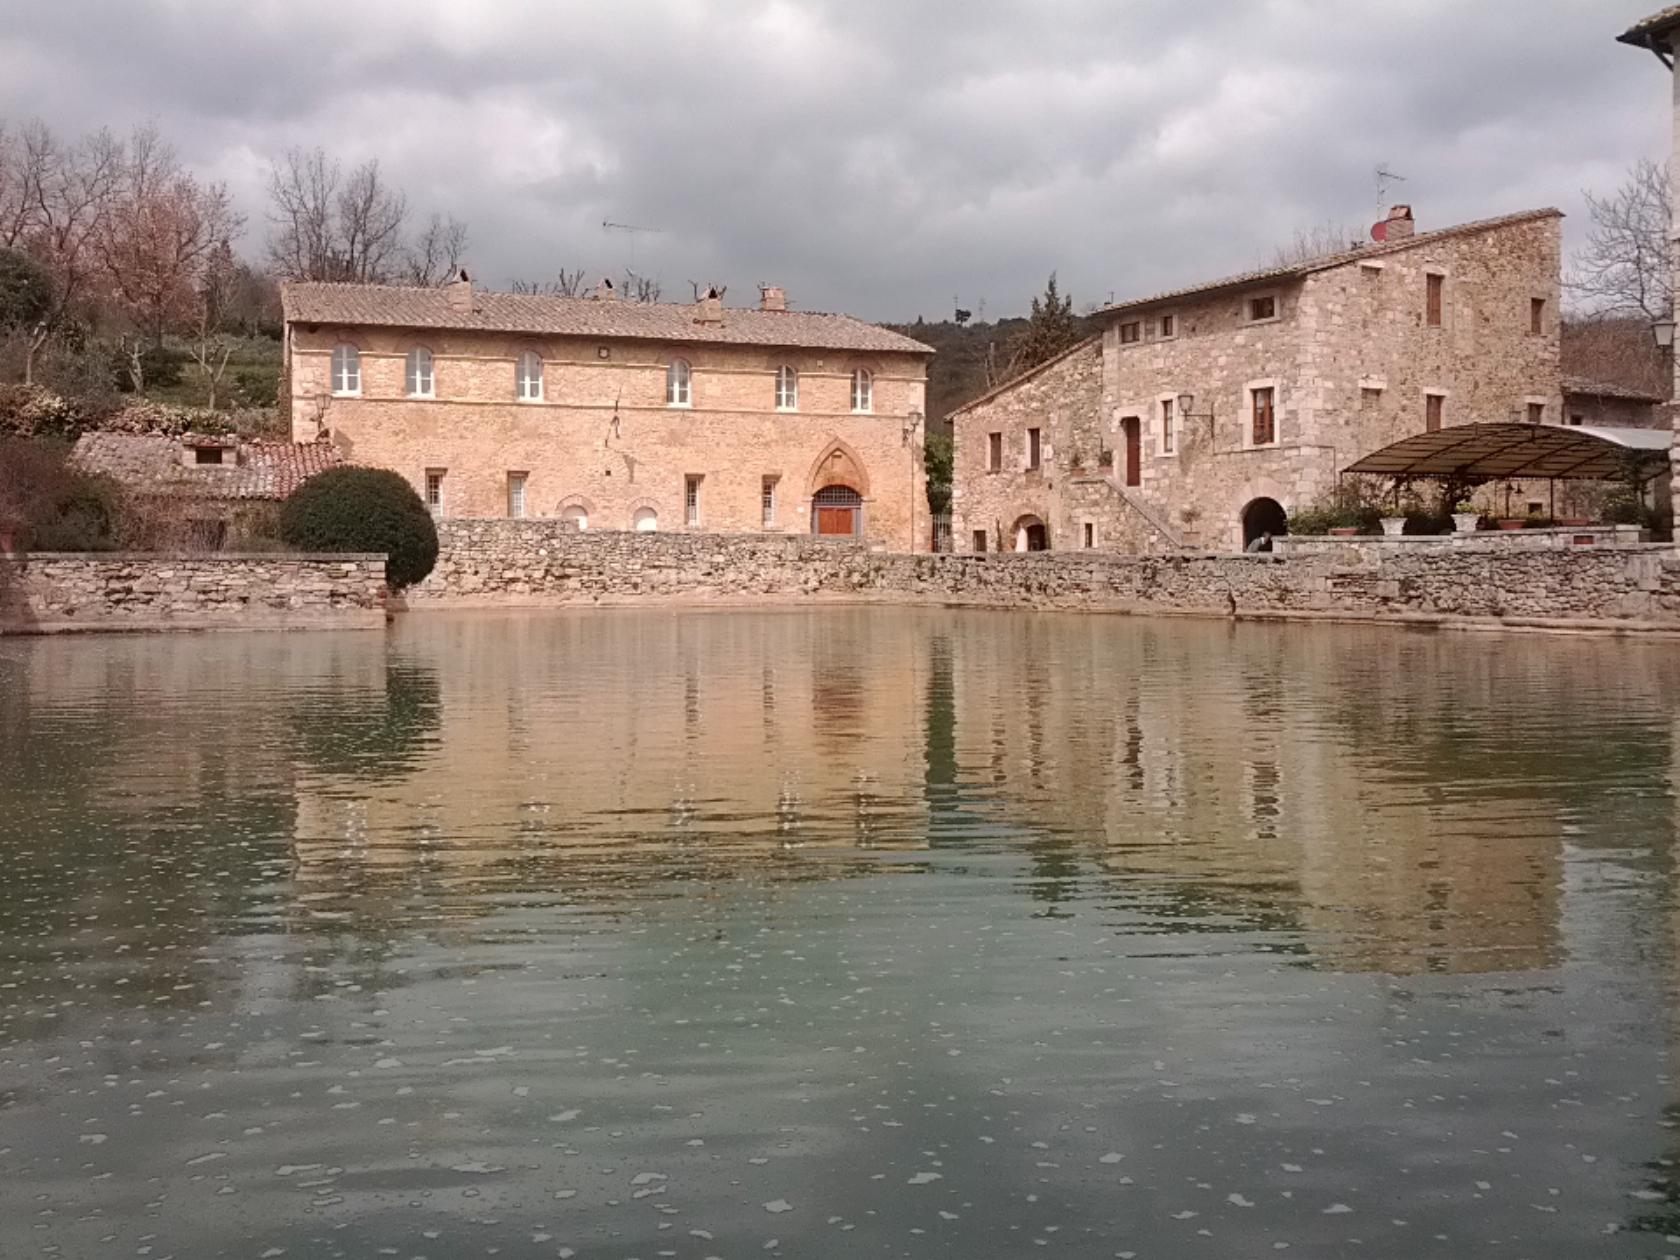 File:Bagni Vignone - Siena.jpeg - Wikimedia Commons